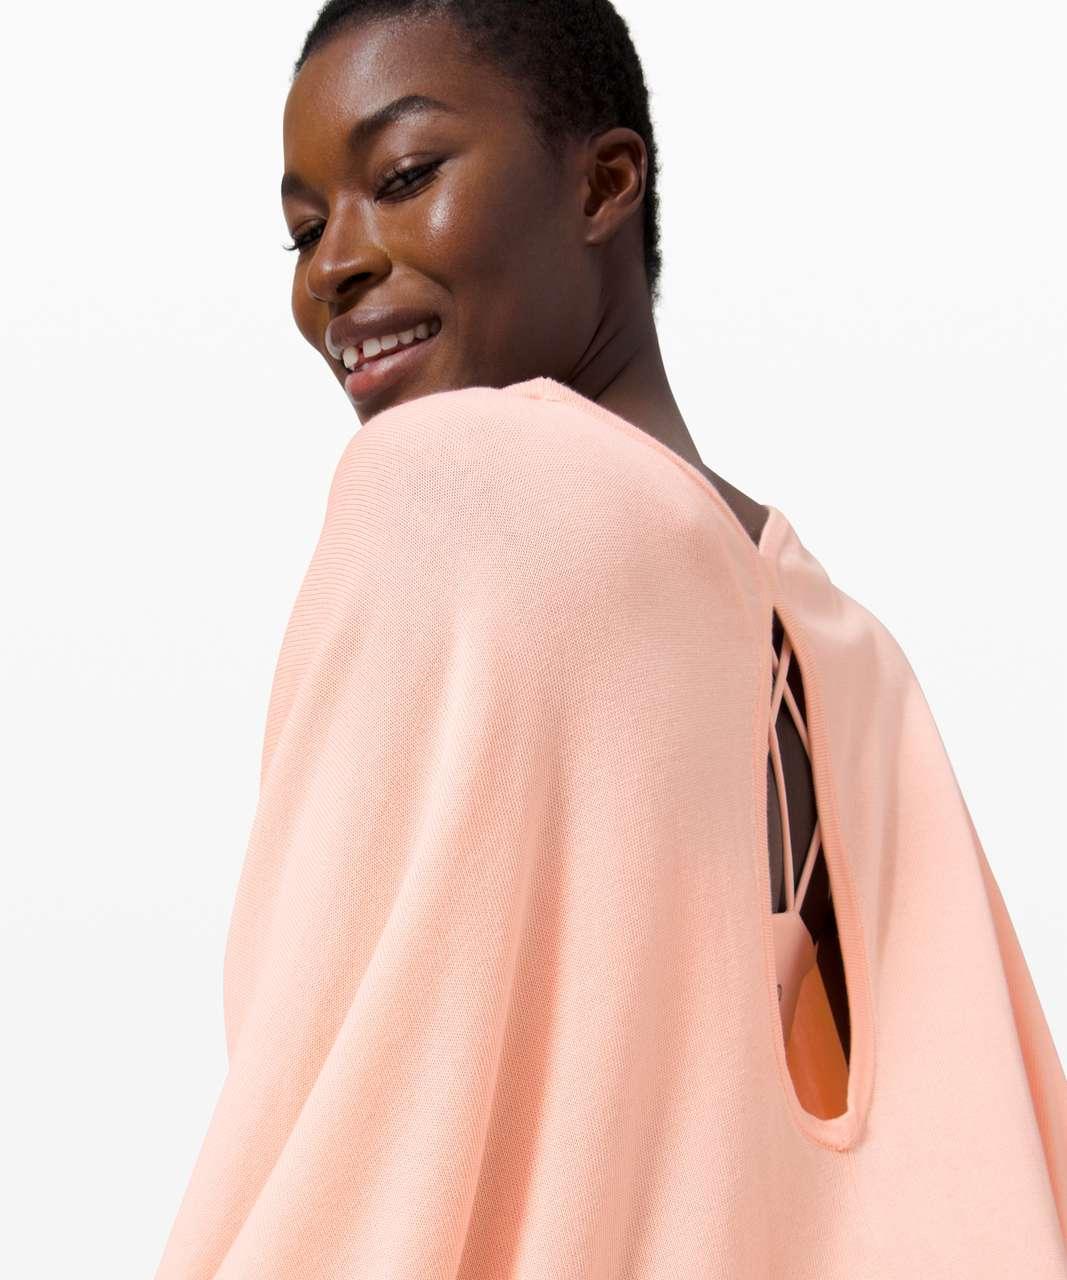 Lululemon Key to Warmth Wrap - Ballet Slipper